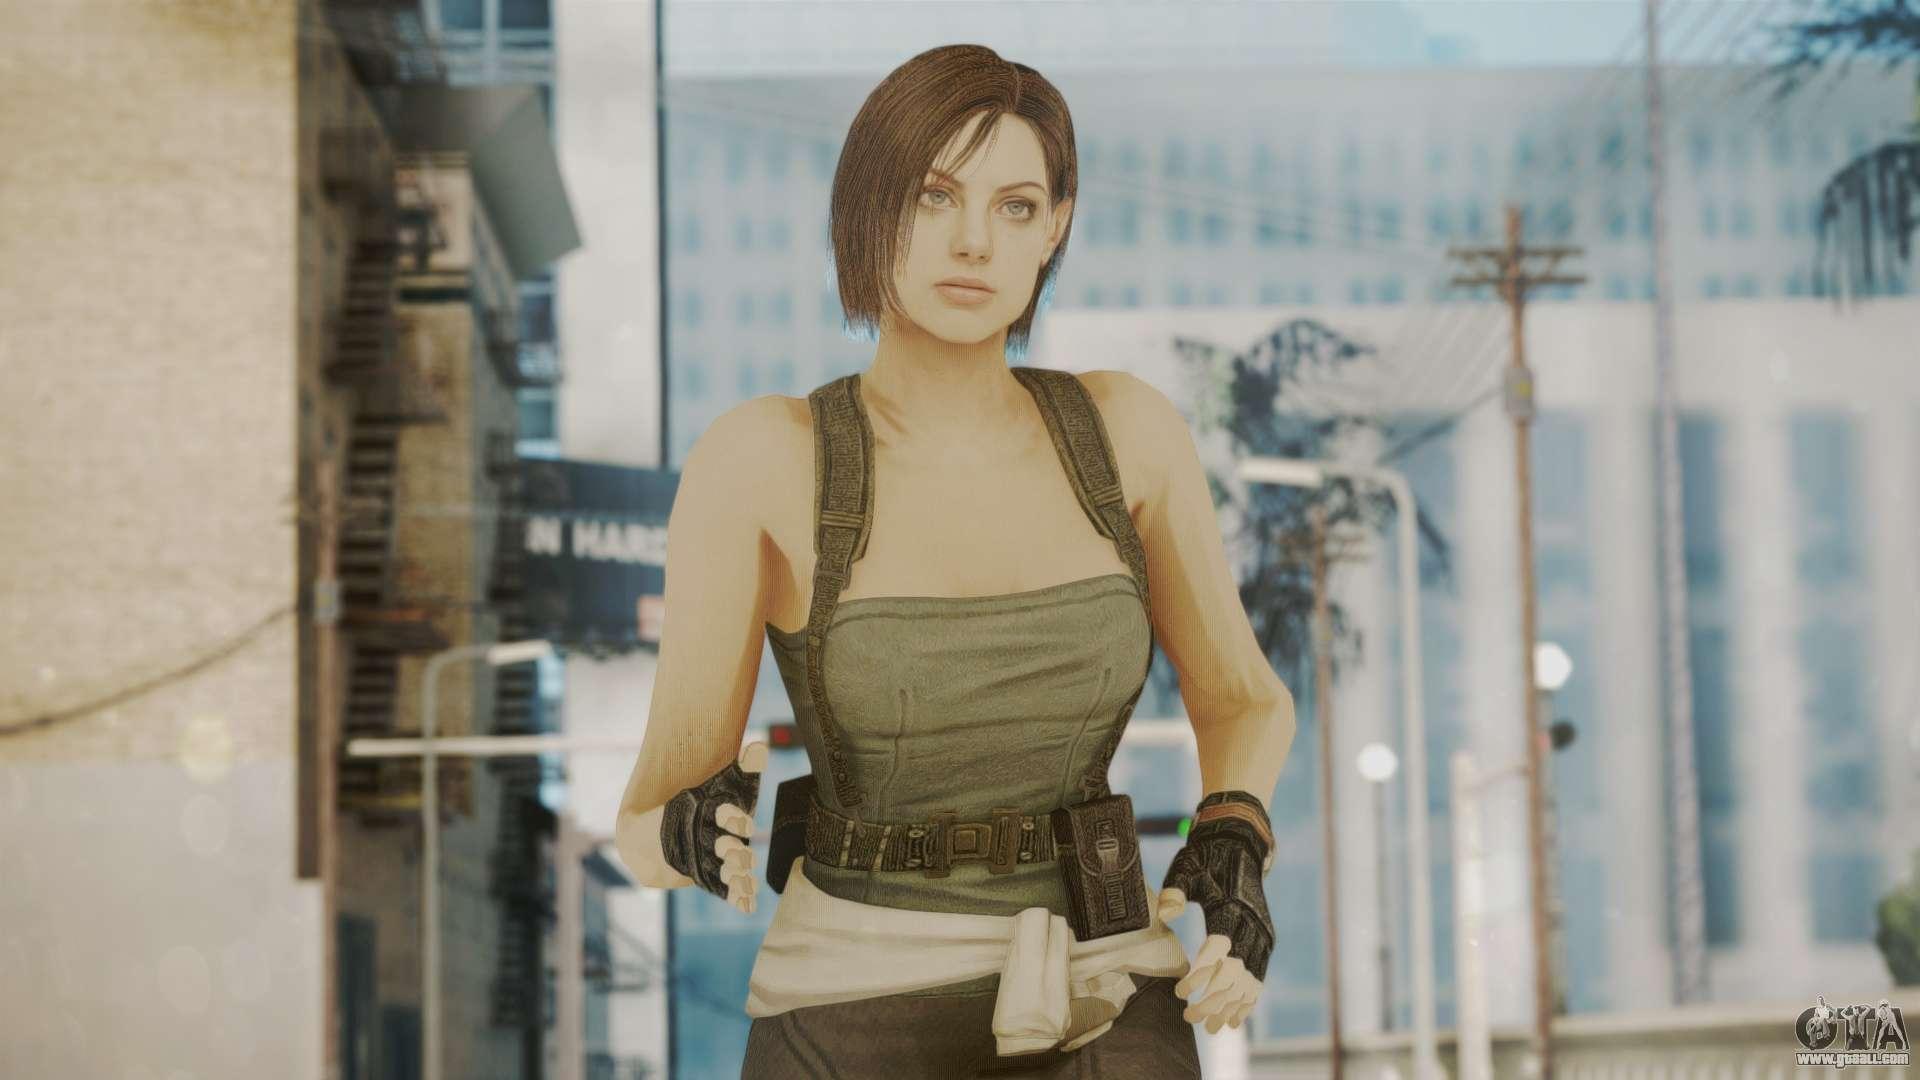 Resident Evil Remake Hd - Jill Valentine For Gta San Andreas-2232